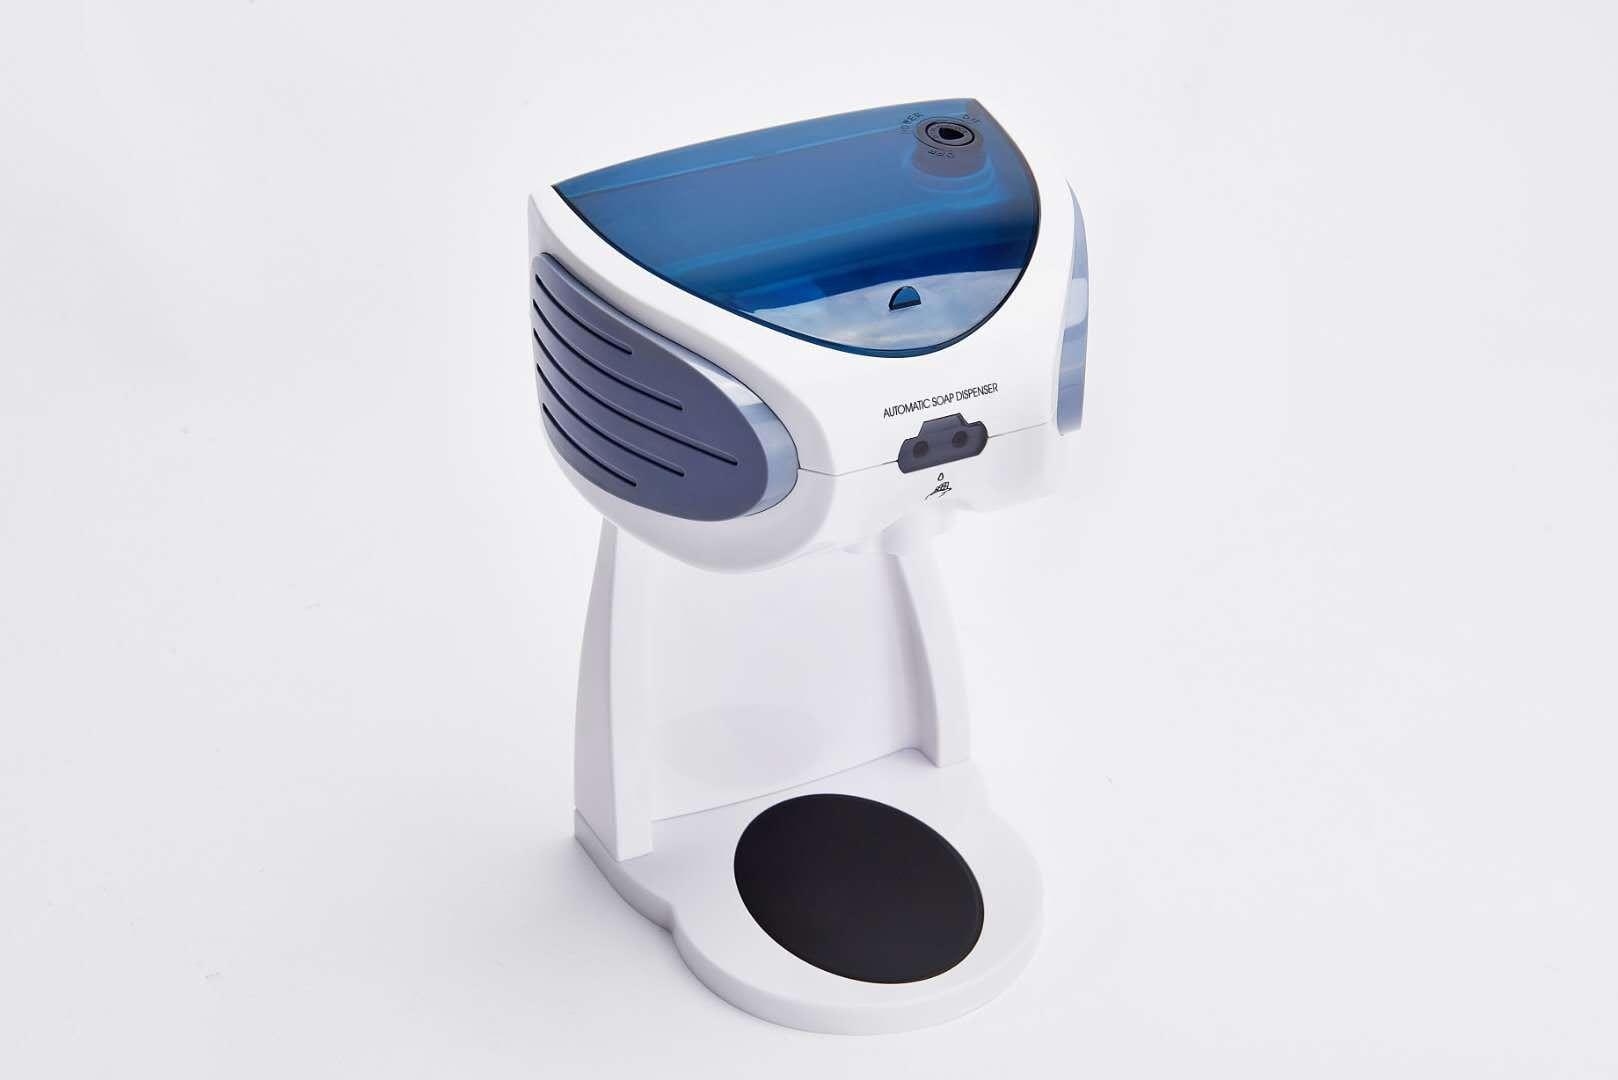 Commercial Table Sensing Soap Dispenser Alcohol Machine Automatic Sensing Alcohol Machine Infrared Sensing Hand SterilizerWF-060 enlarge